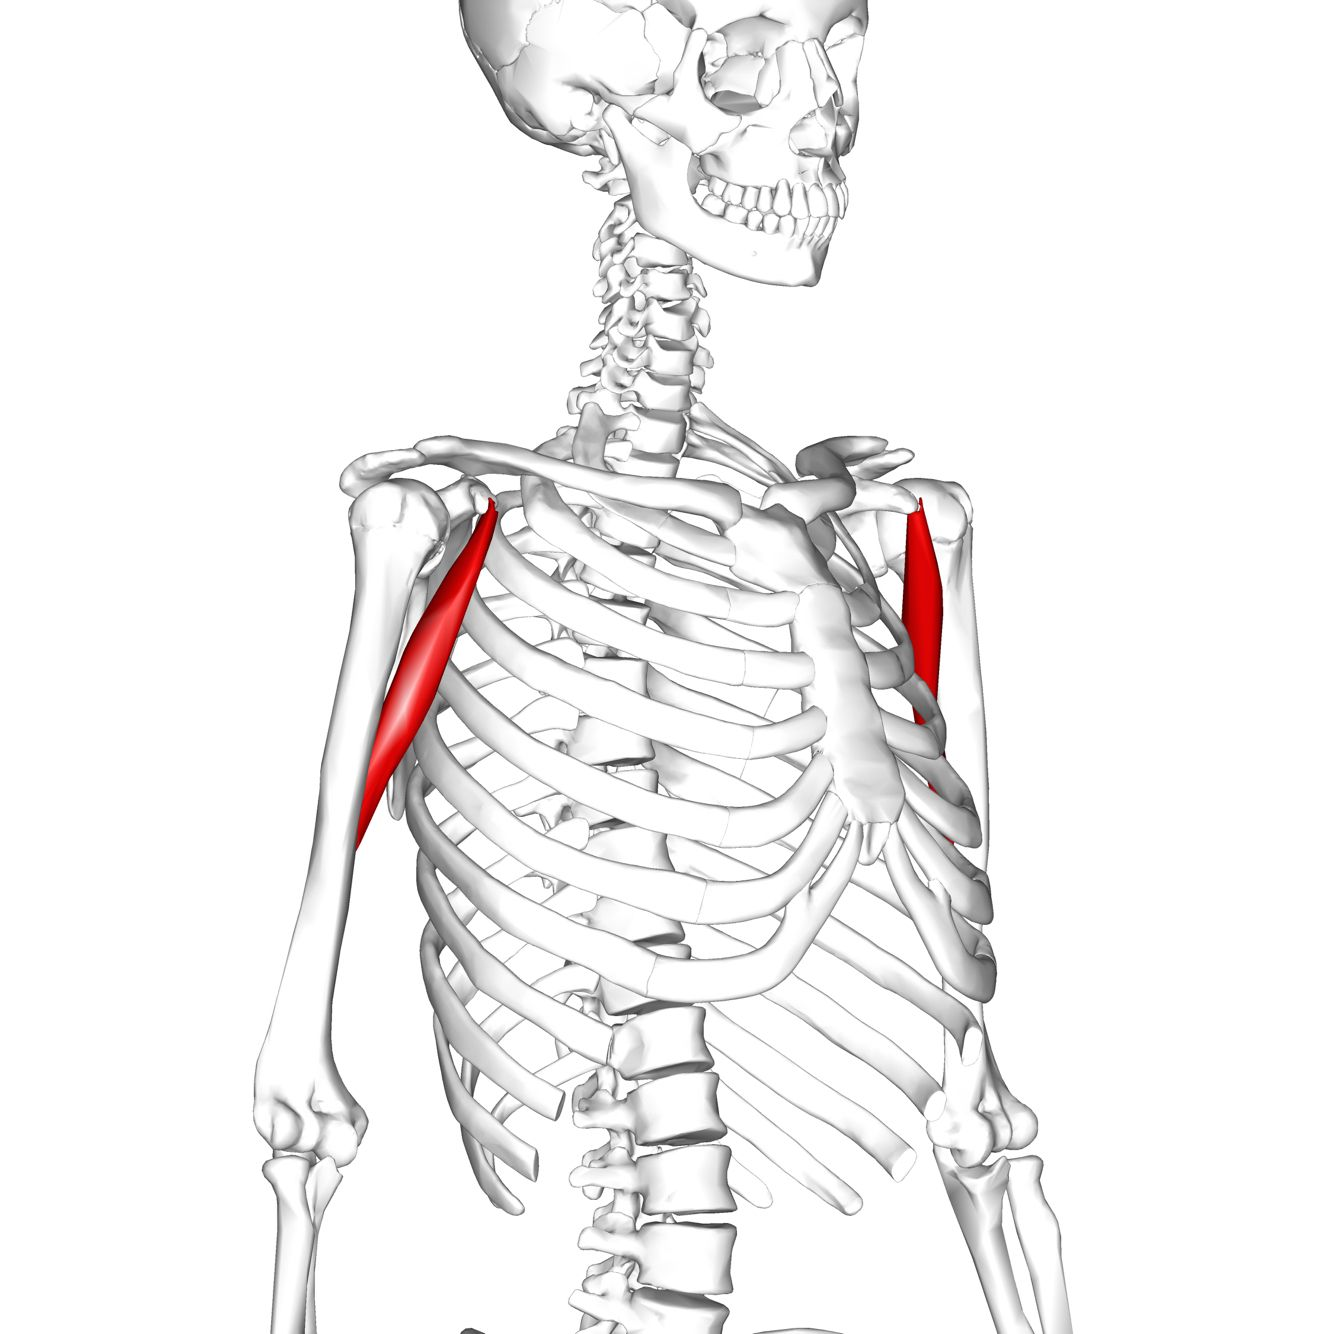 Coracobrachialis Coracoid Process Of Scapula Origin Medial Third Border Of Humerus Insertion